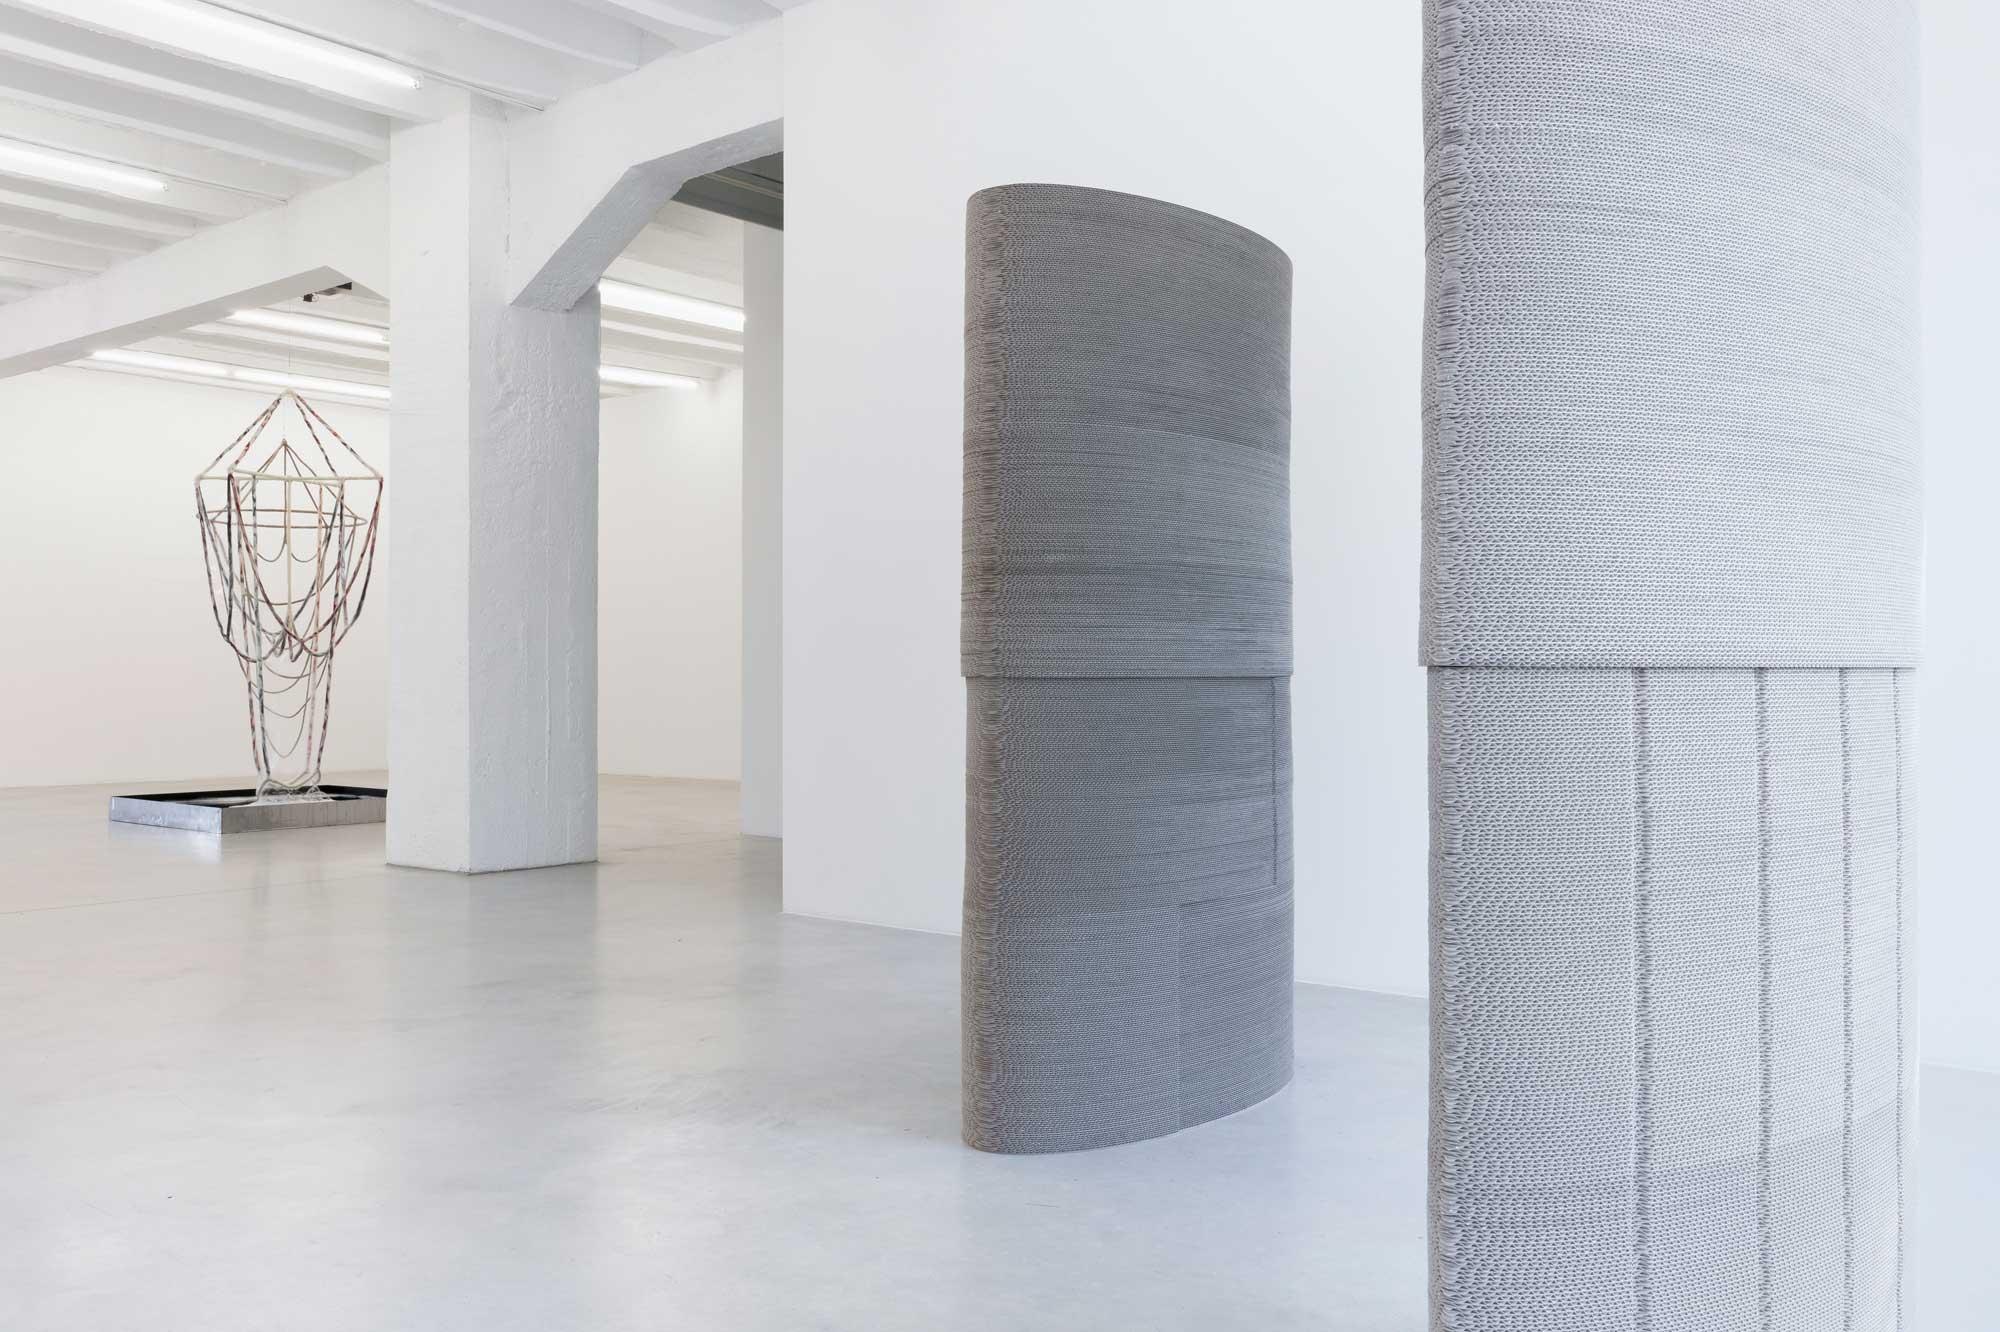 Tobias Putrih: Pale Guardians, exhibition view, Galerija Gregor Podnar, Berlin, 2015. Photo: Marcus Schneider